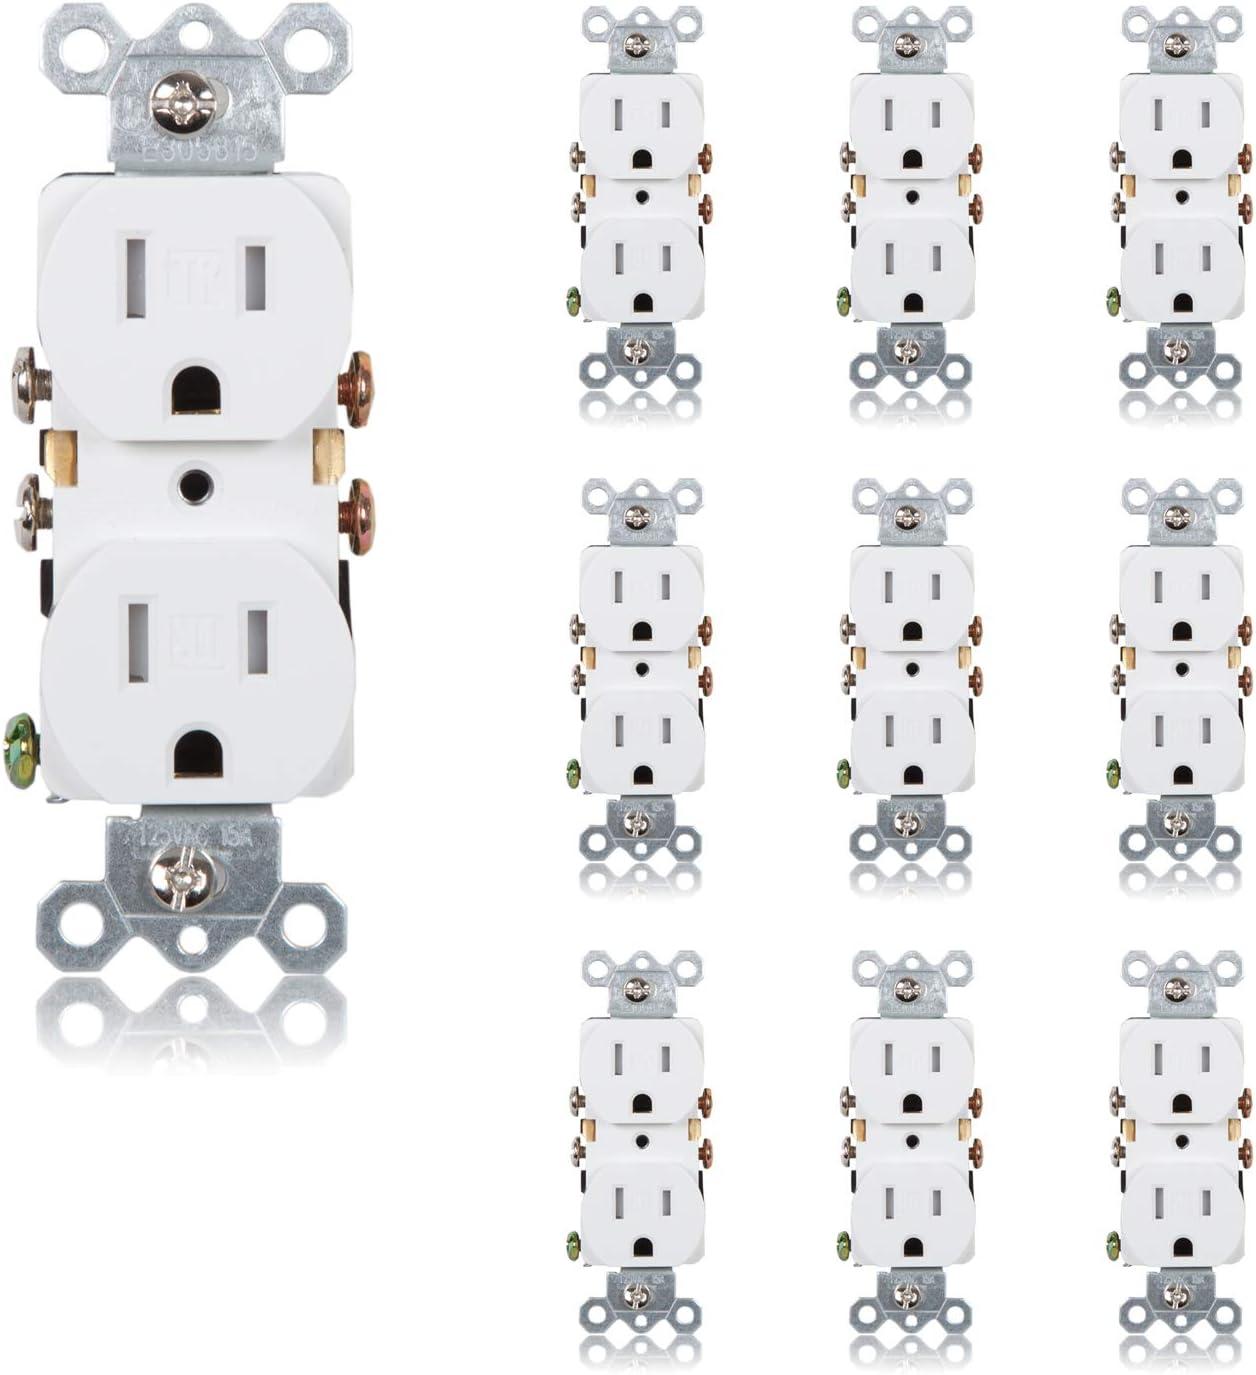 Finally Sacramento Mall resale start Maxxima Tamper Resistant Duplex Electrical Standard W Receptacle